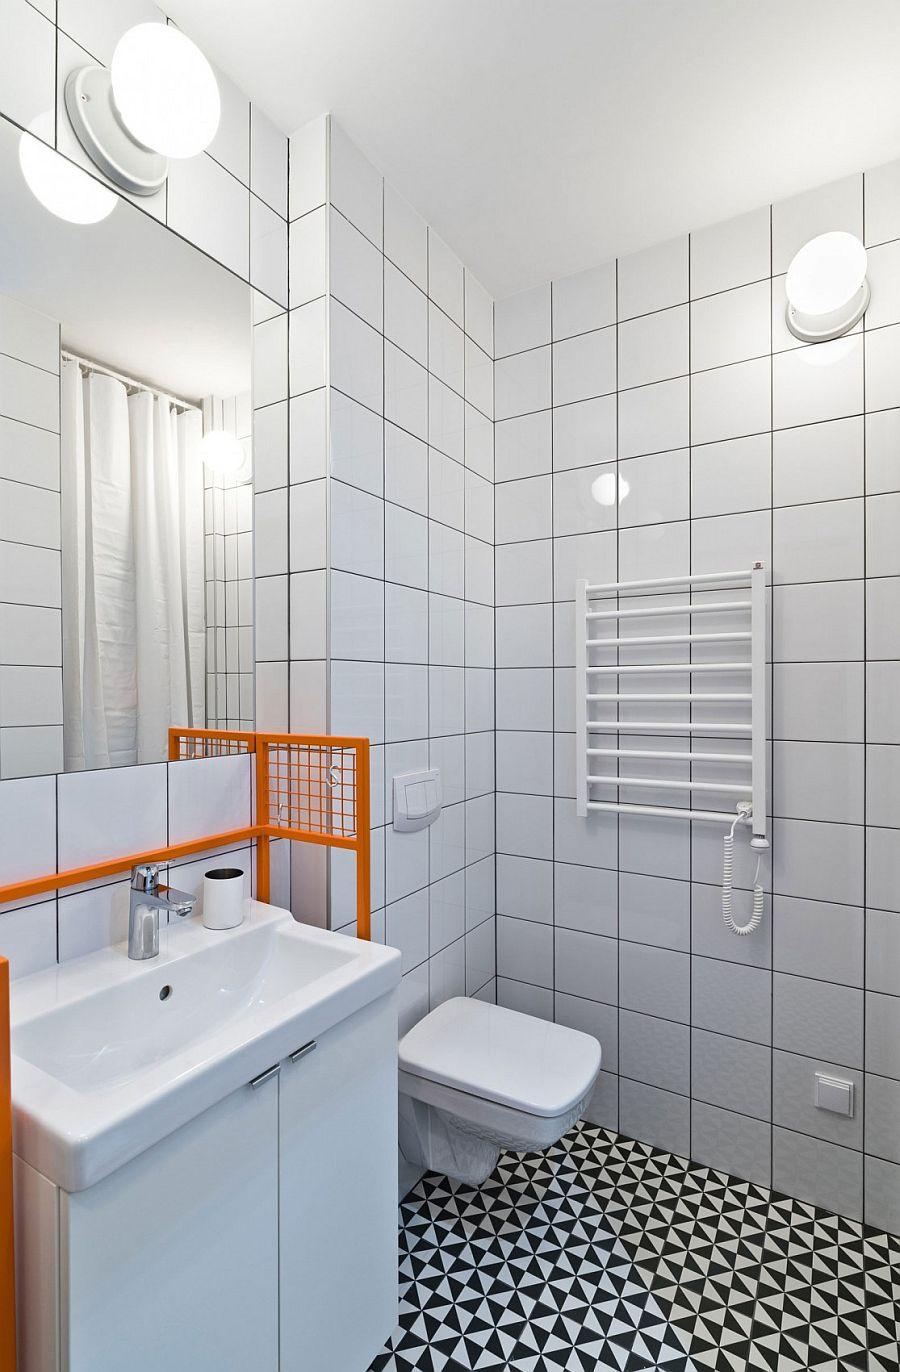 Black and white floor tiles for the tiny bathroom in light gray